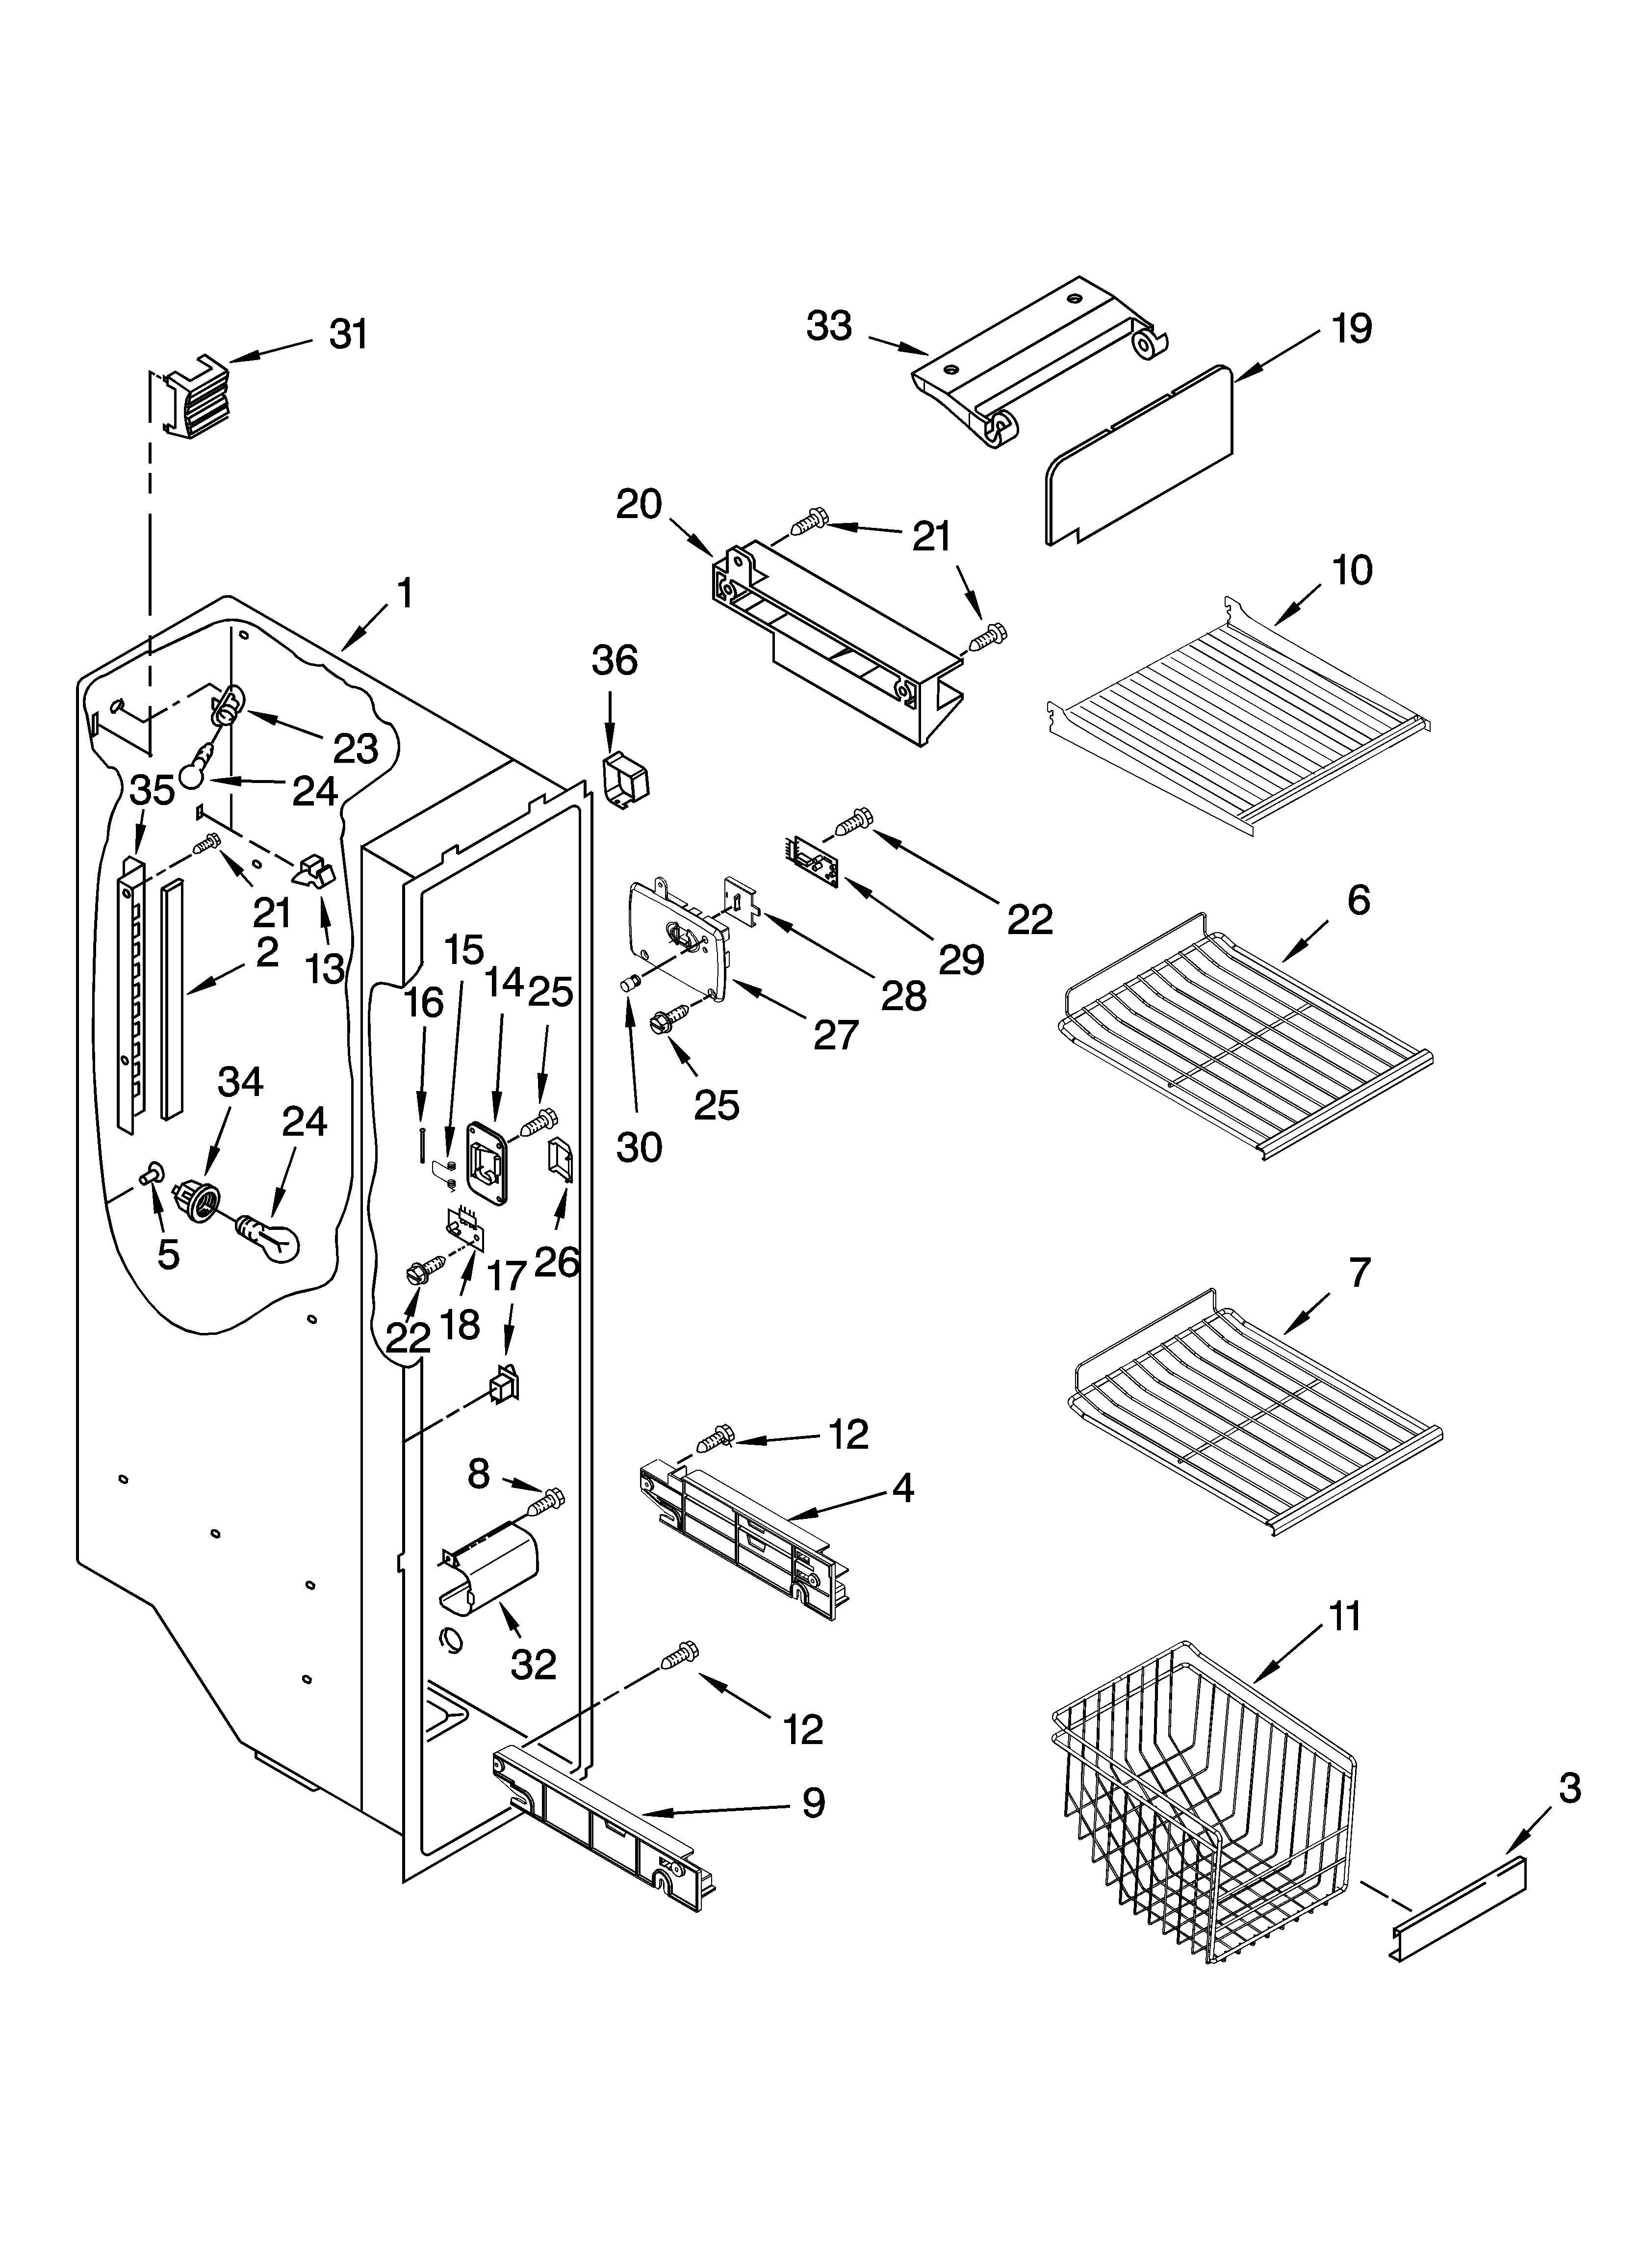 Frigidaire Ice Maker Parts Diagram Kenmore Refrigerator Ice Maker Parts Frigidaire